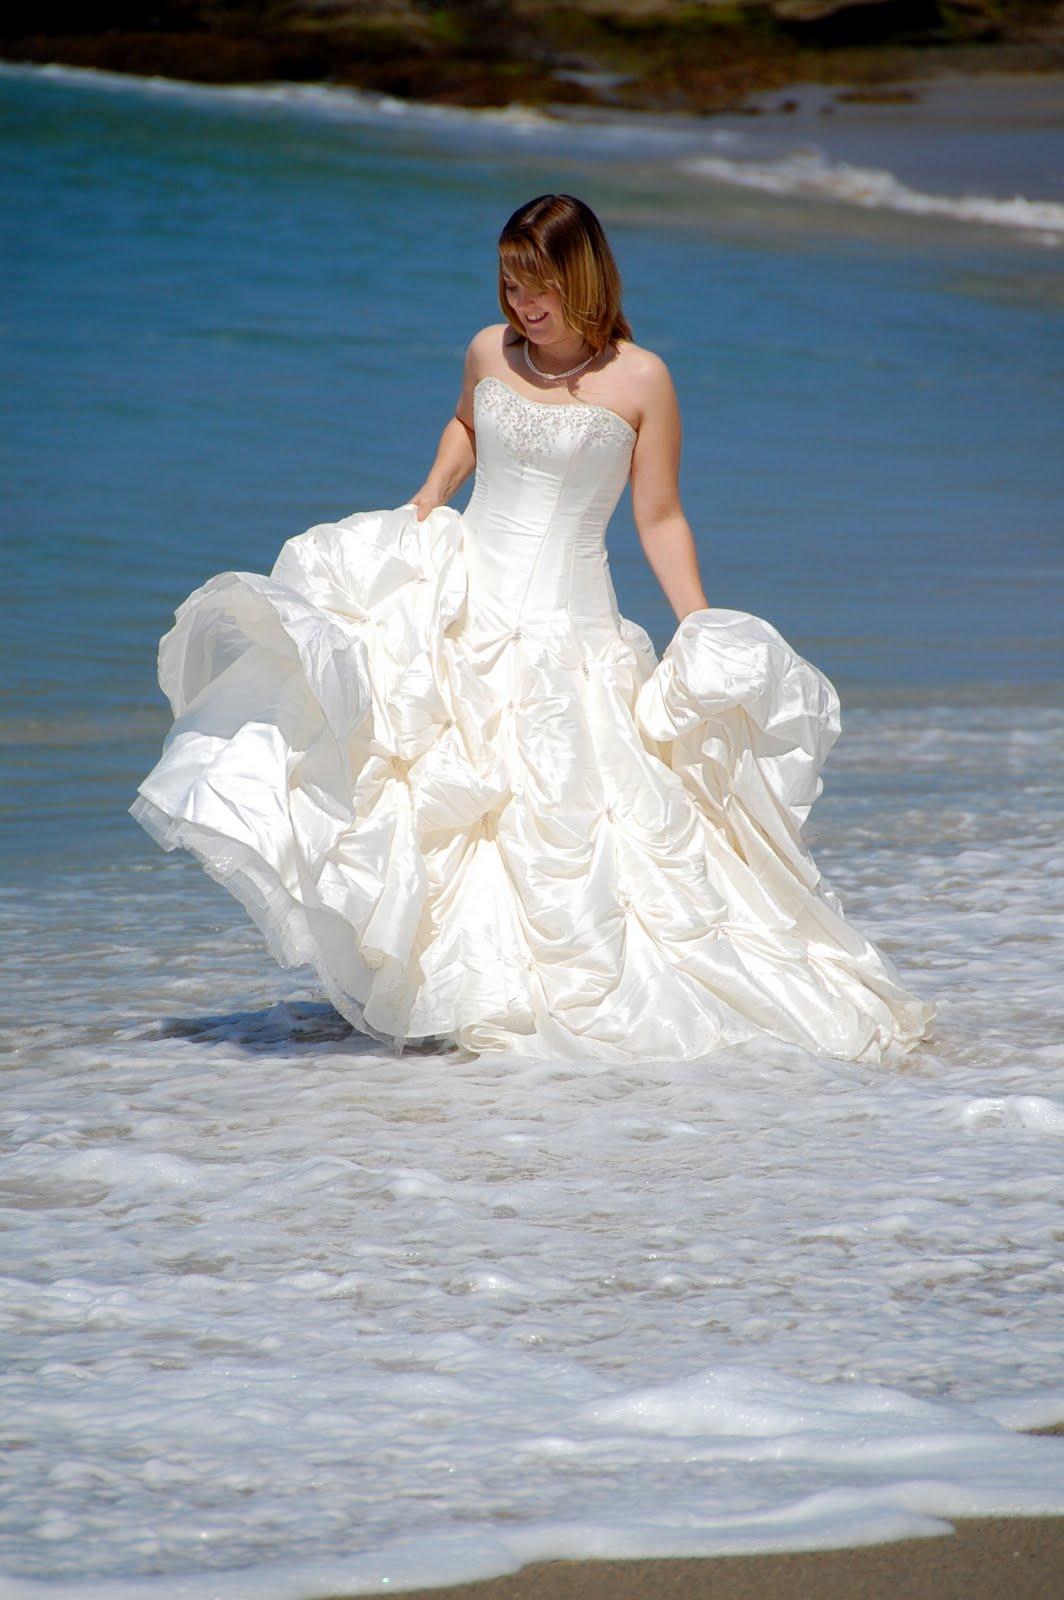 Wedding Photography Career: Wedding Photography Careers – Some Useful Tips